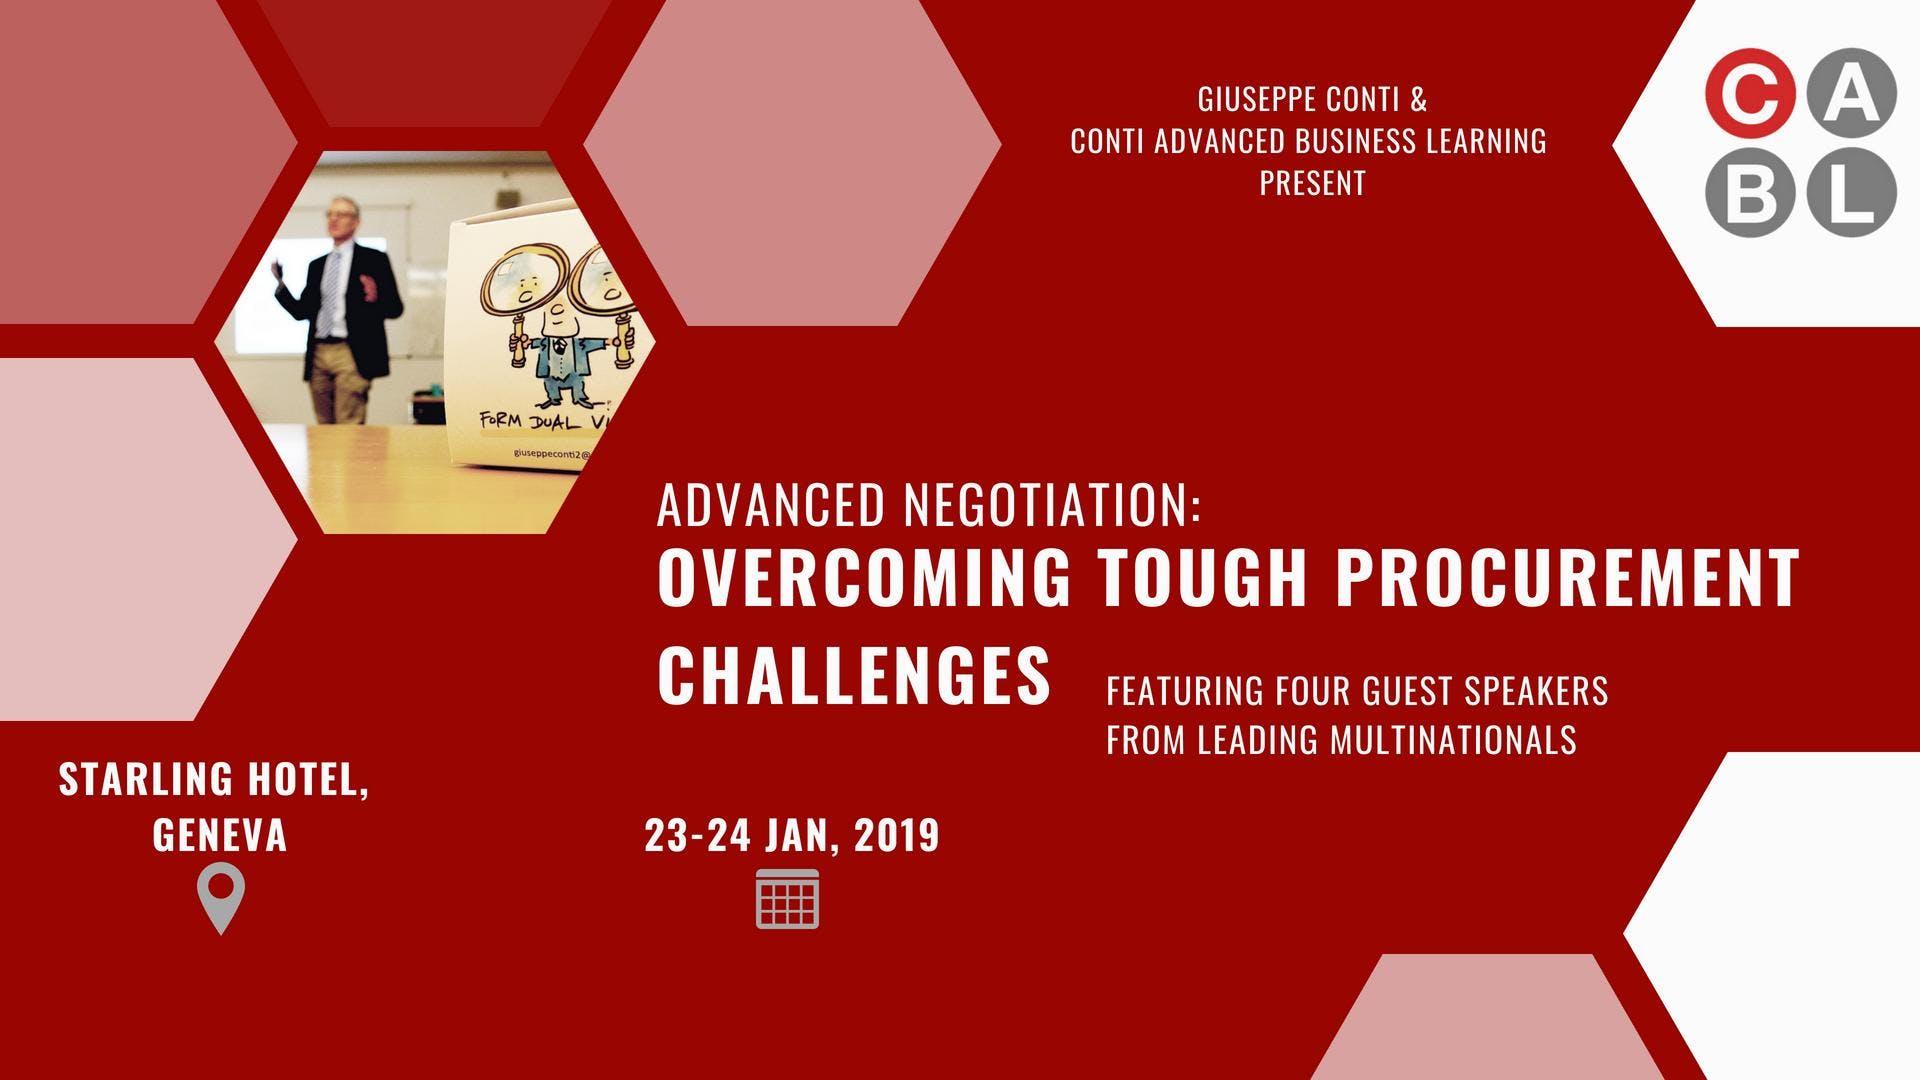 Advanced Negotiation: Overcoming Tough Procurement Challenges (2 Day Workshop)